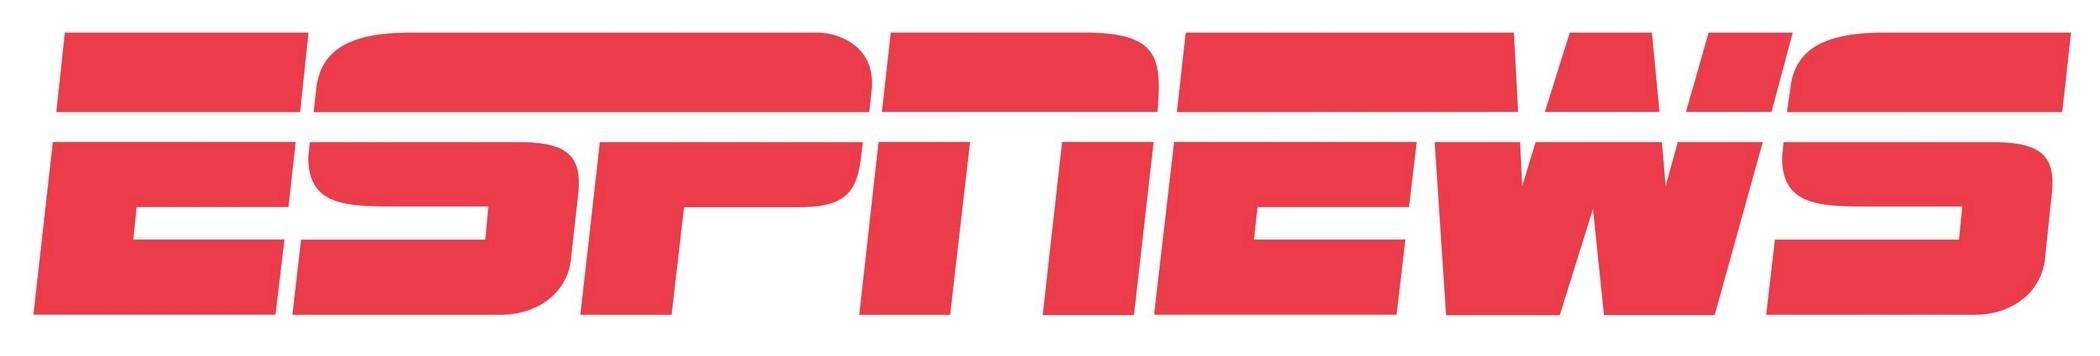 ESPNEWS_logo